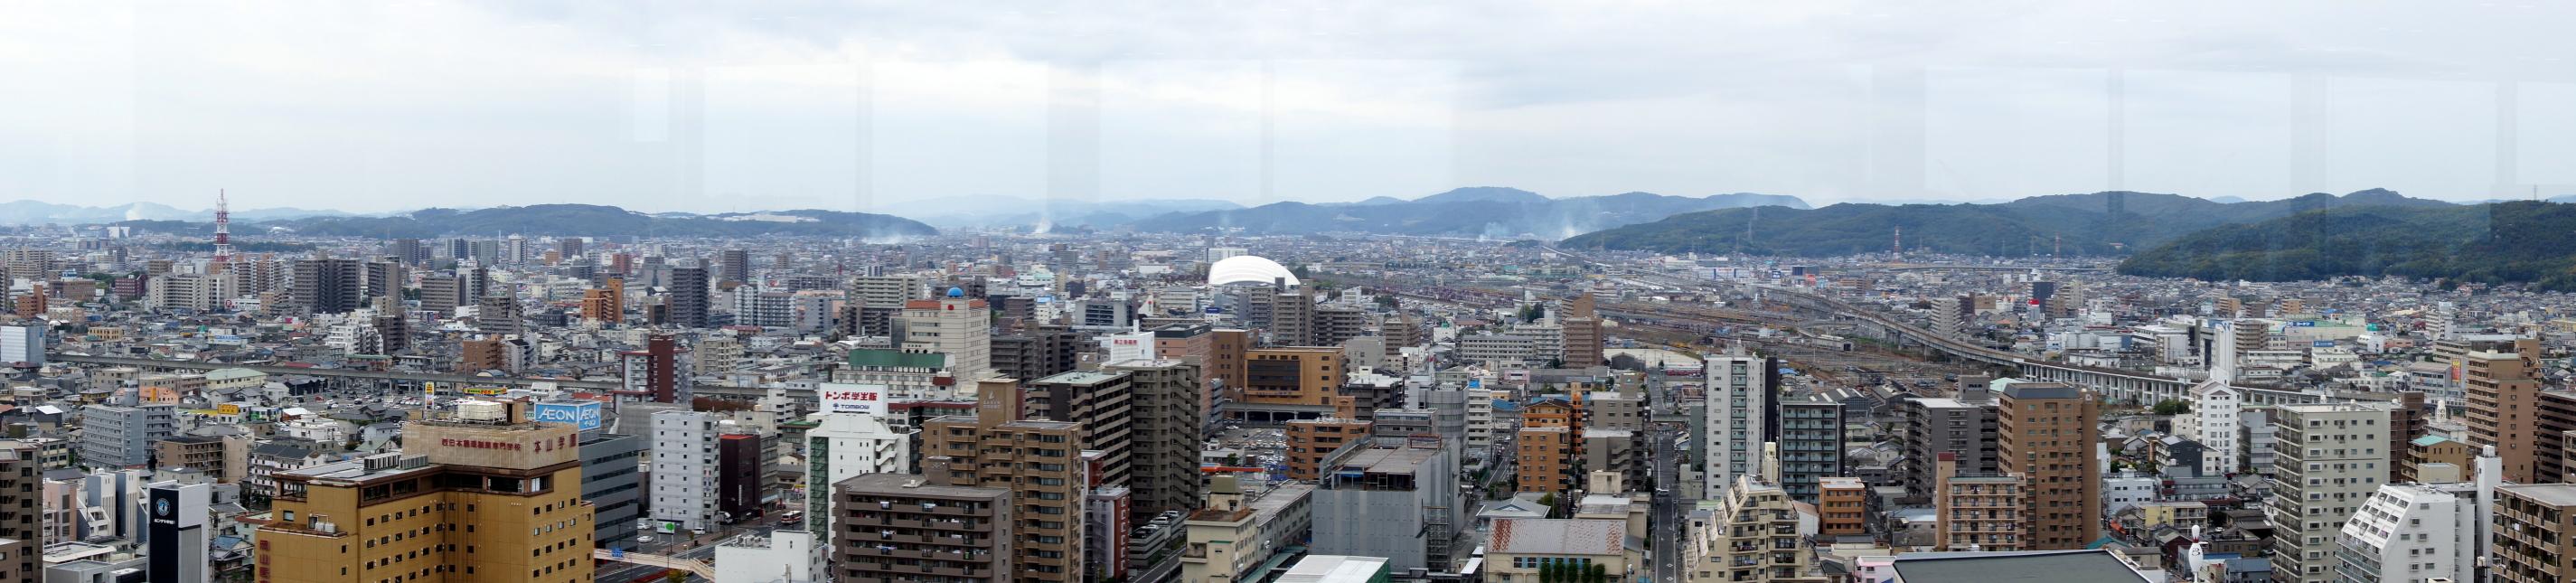 okayama-city-kita-ward-panorama